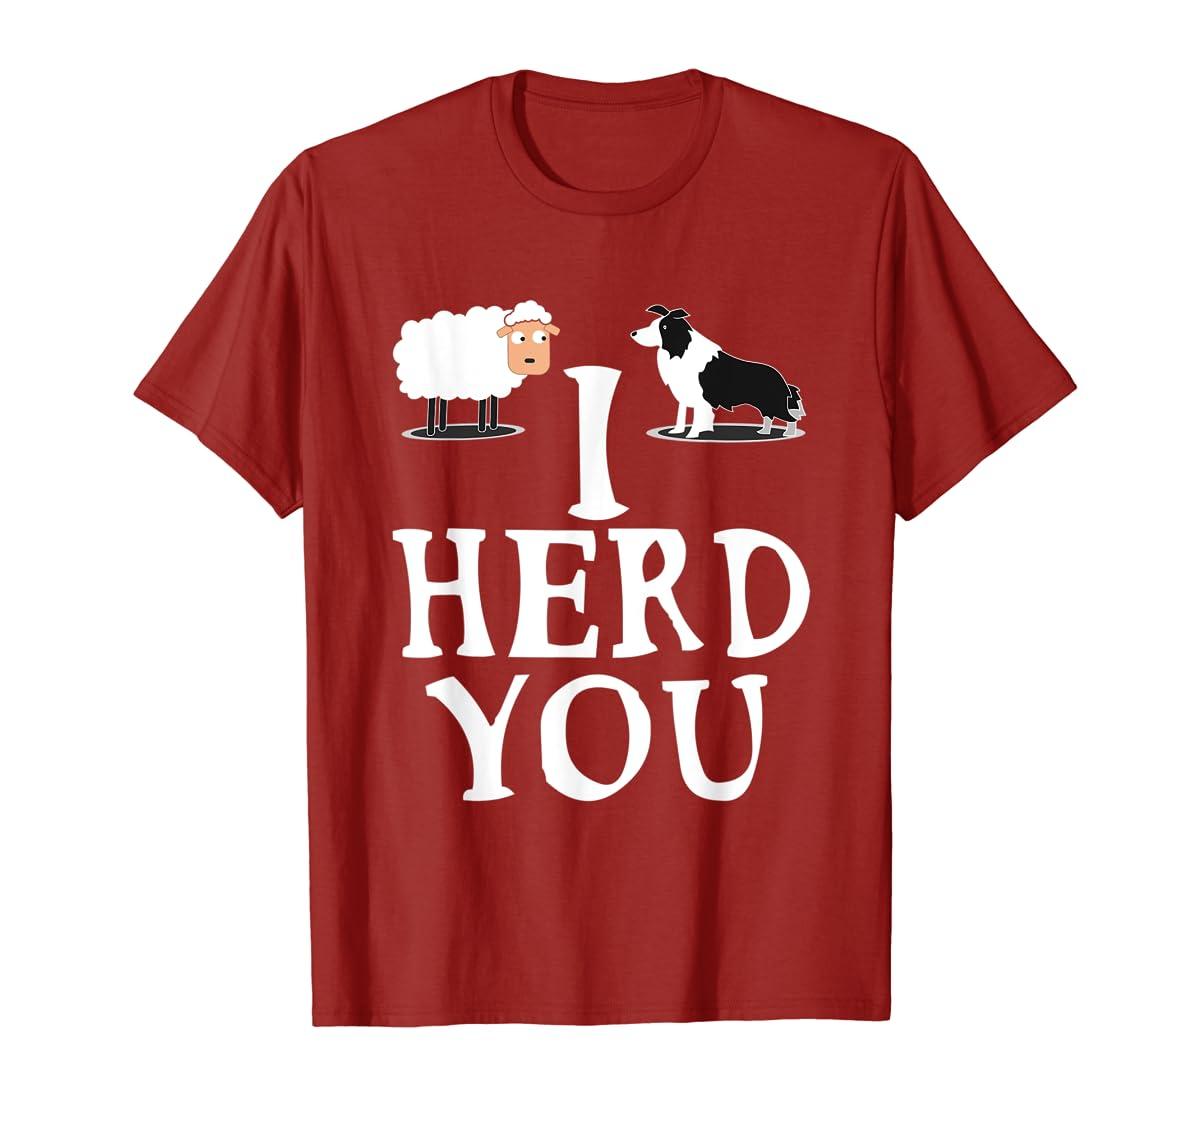 I HERD YOU BORDER COLLIE T shirt Gifts for Men Women Kids-Men's T-Shirt-Red